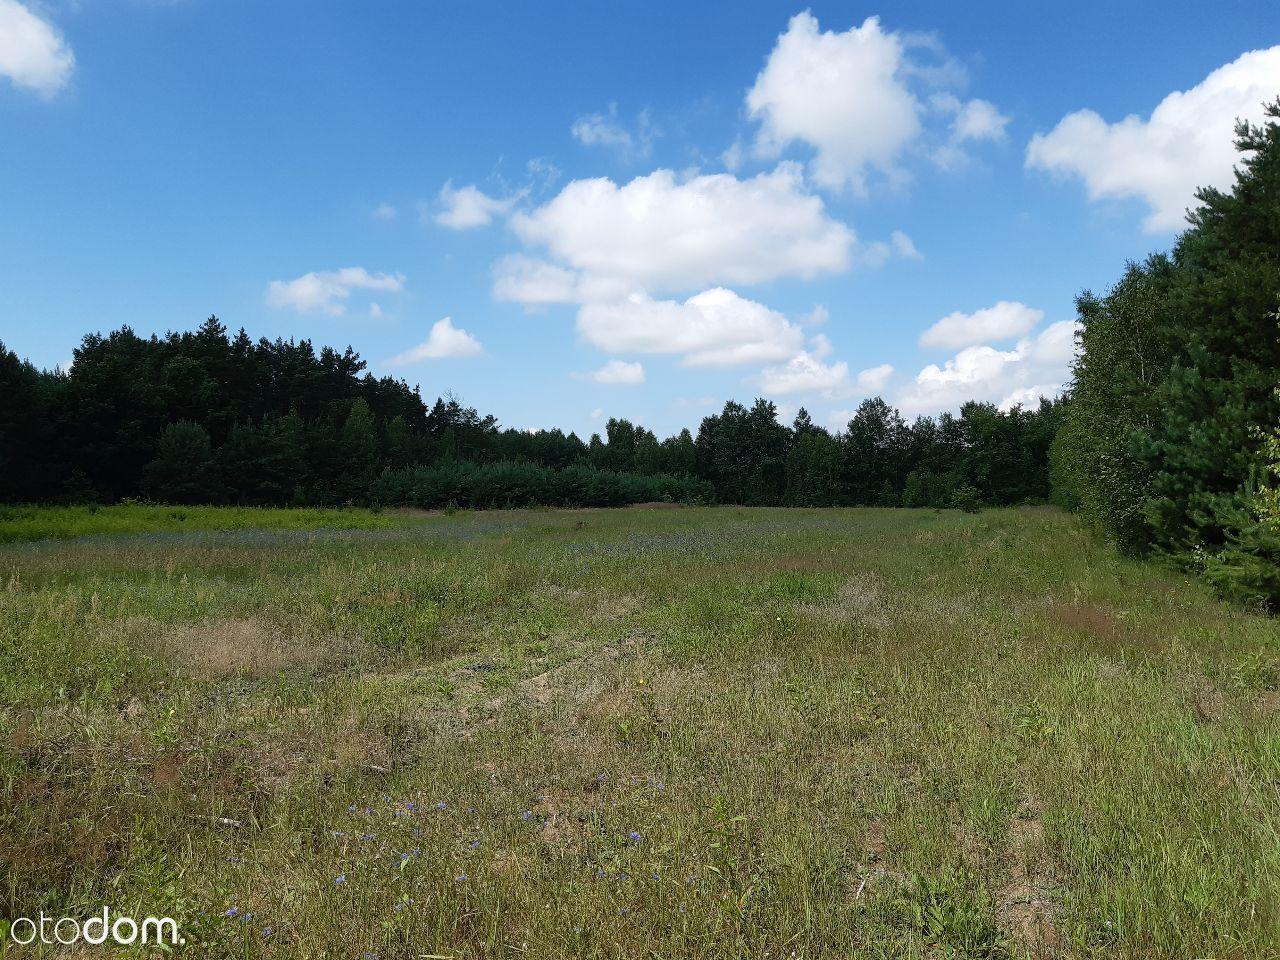 działka rolno-leśna, 1,8 ha